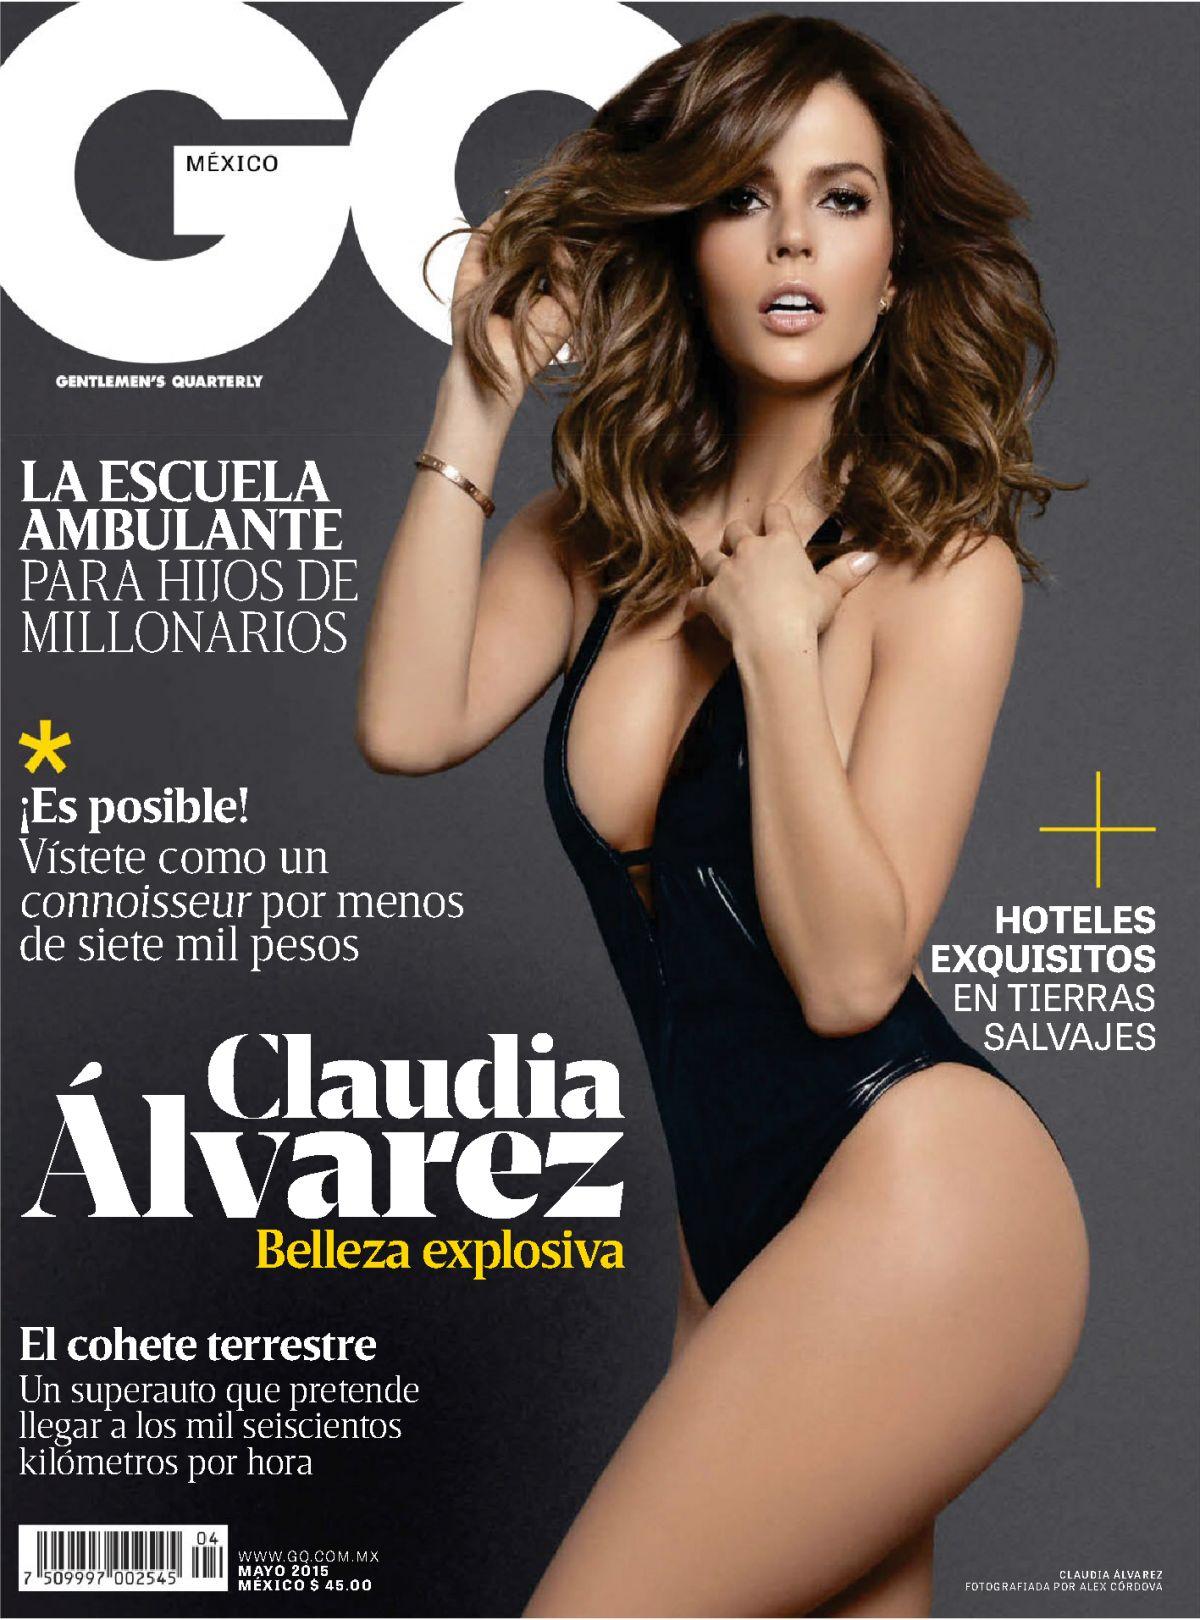 CLAUDIA ALVAREZ in GQ Magazine, Mexico May 2015 Issue